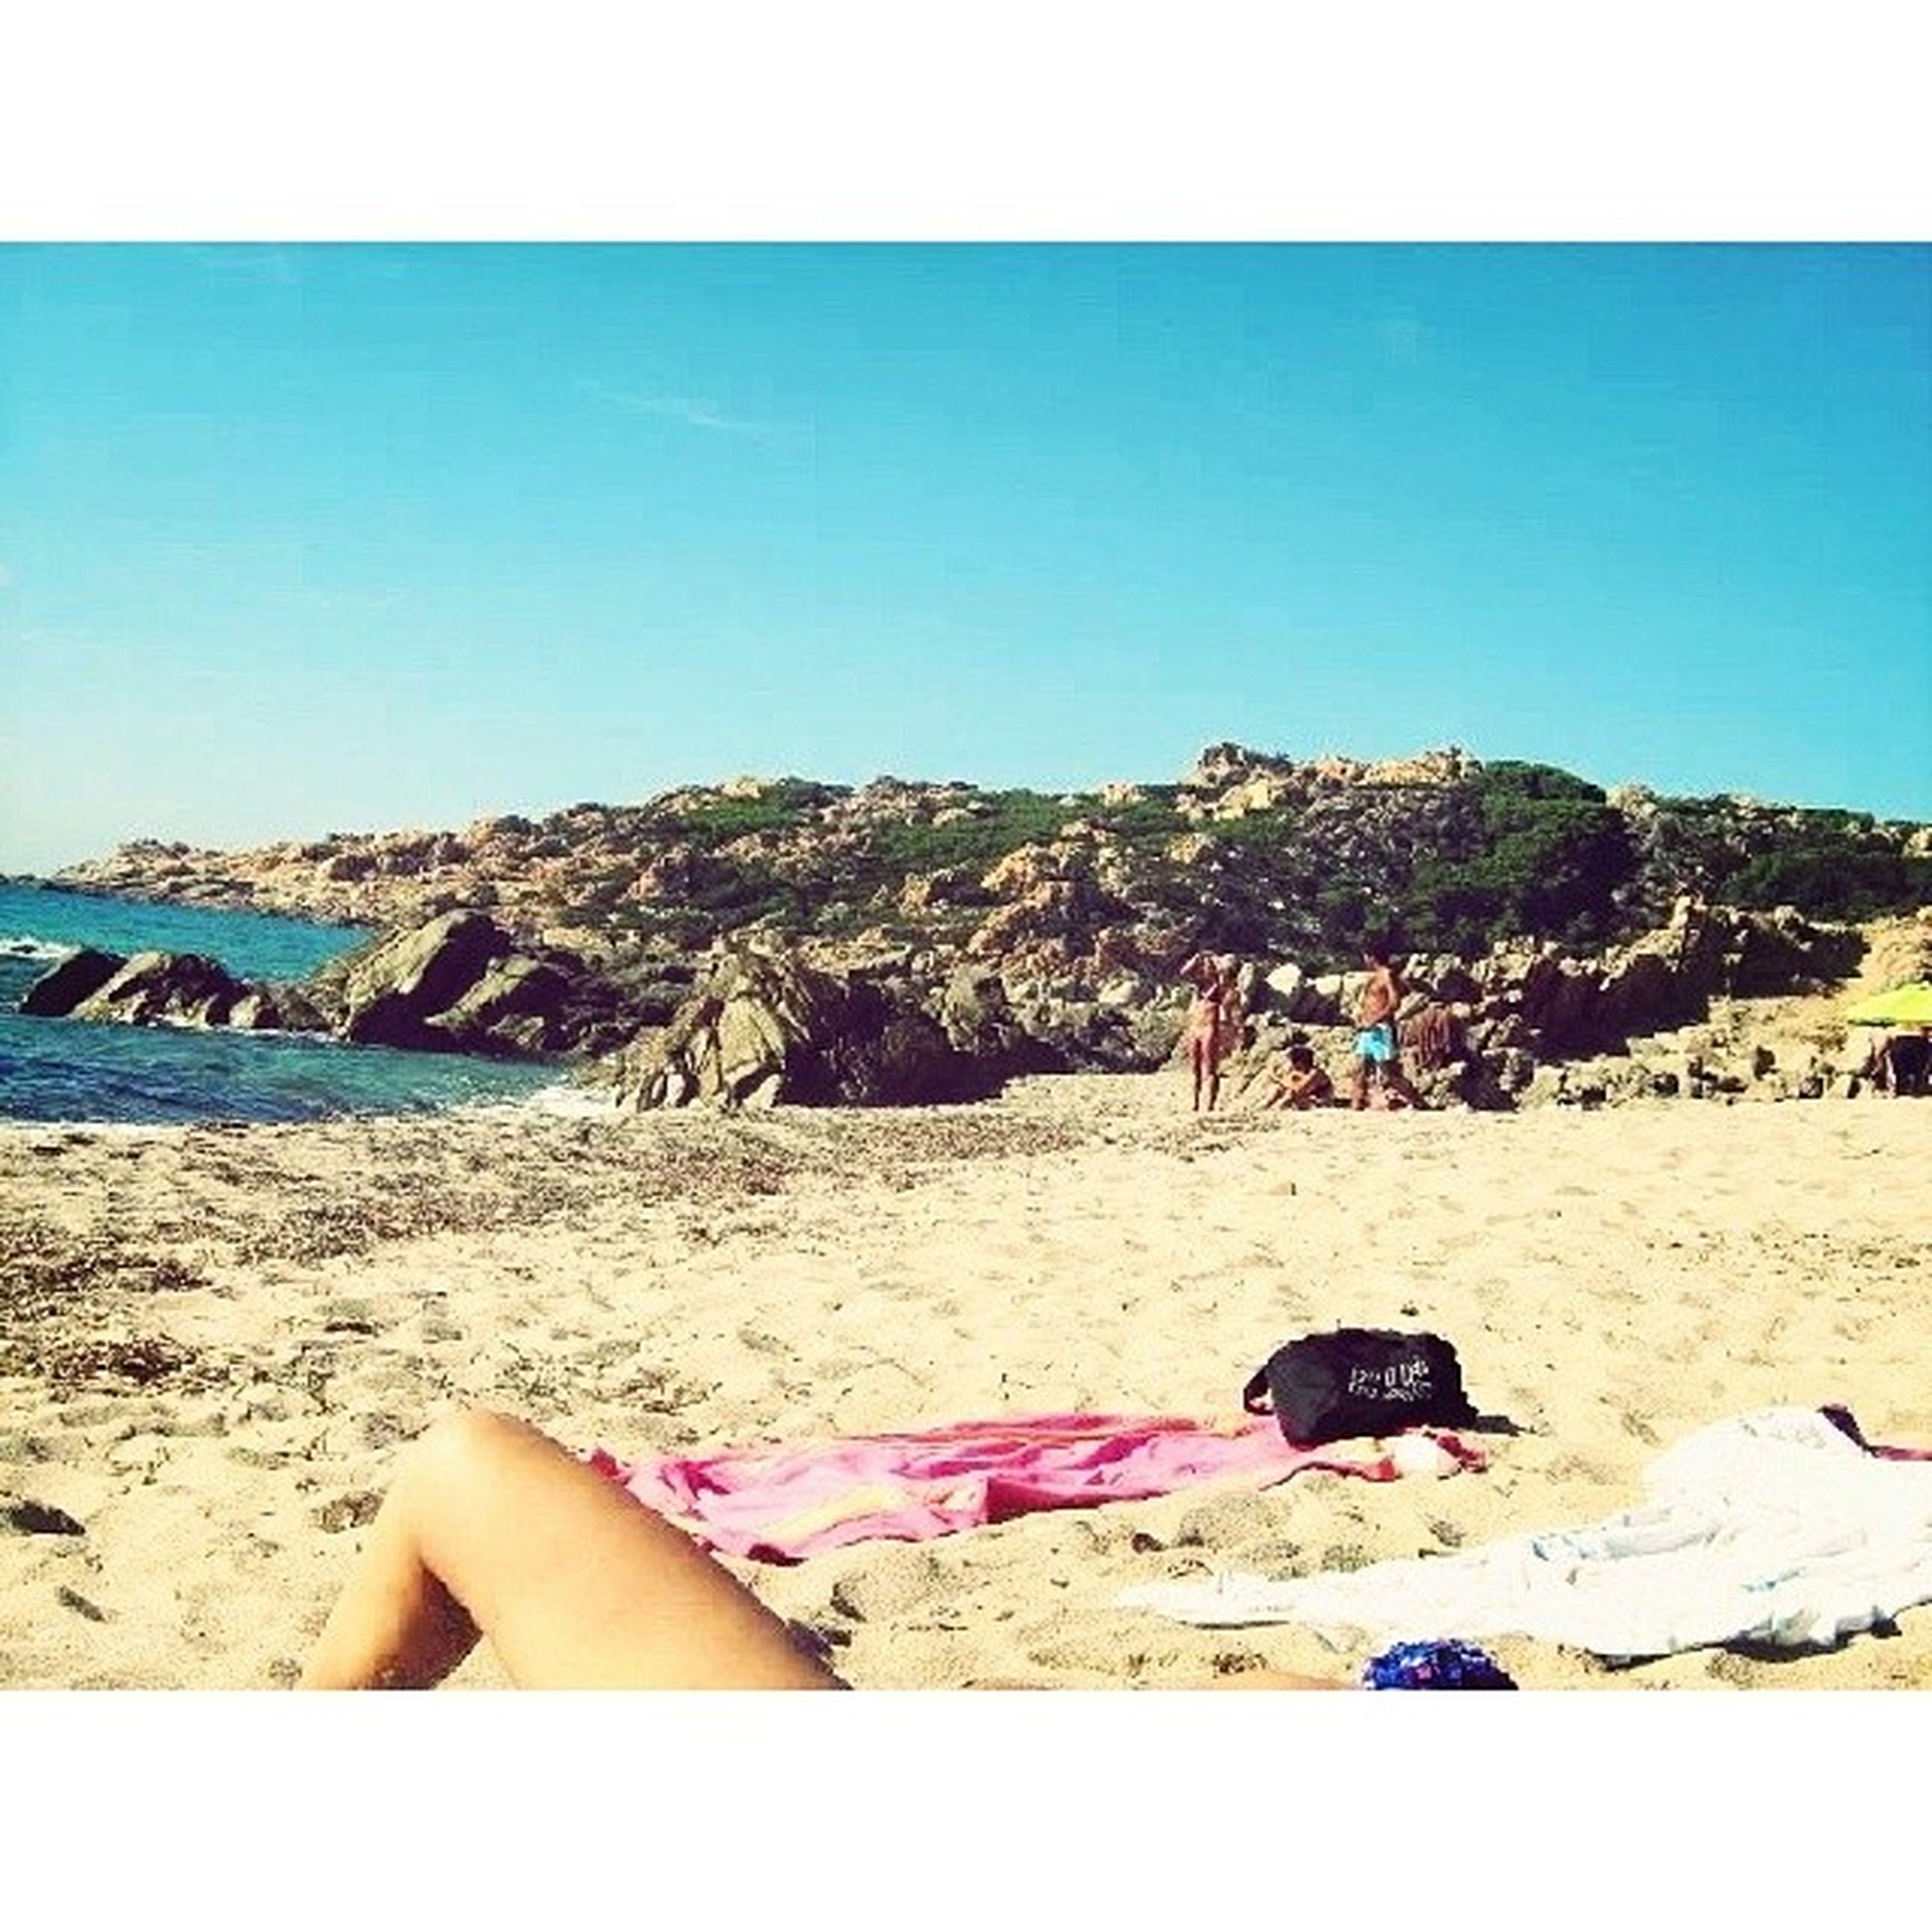 Riportatemi qua. Miss Thisplace Likehome Wannabethererightnow Loveit summer sun fun friends beach summertimes relax indie boho Photo